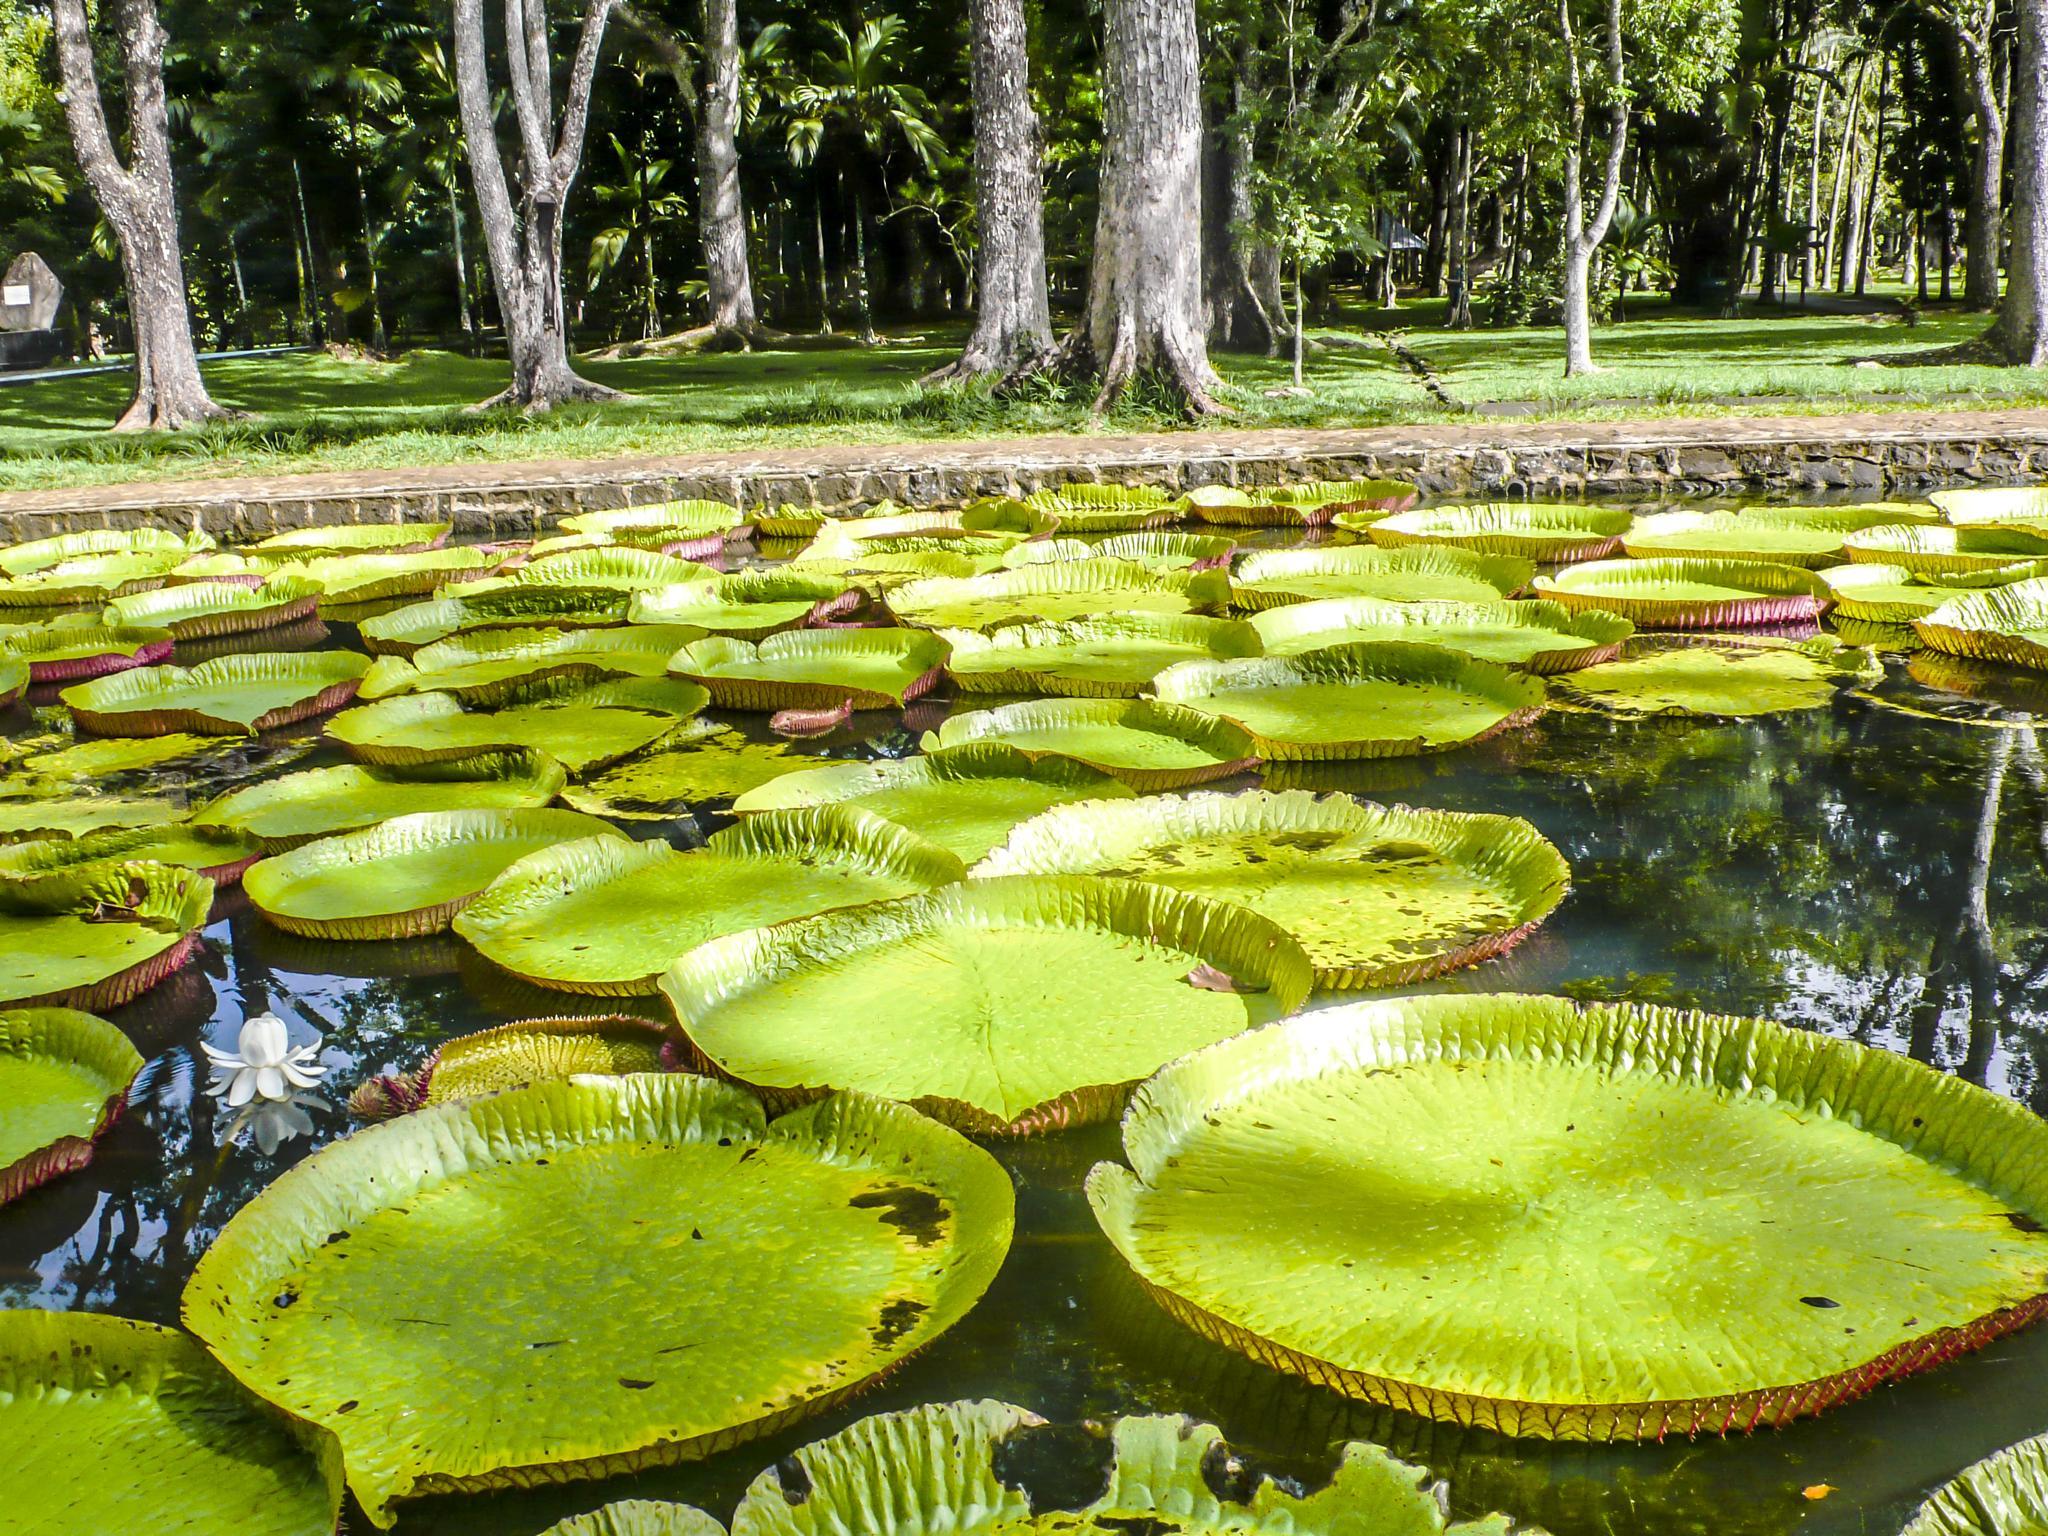 Brazillian Lillies by JanetFernandes